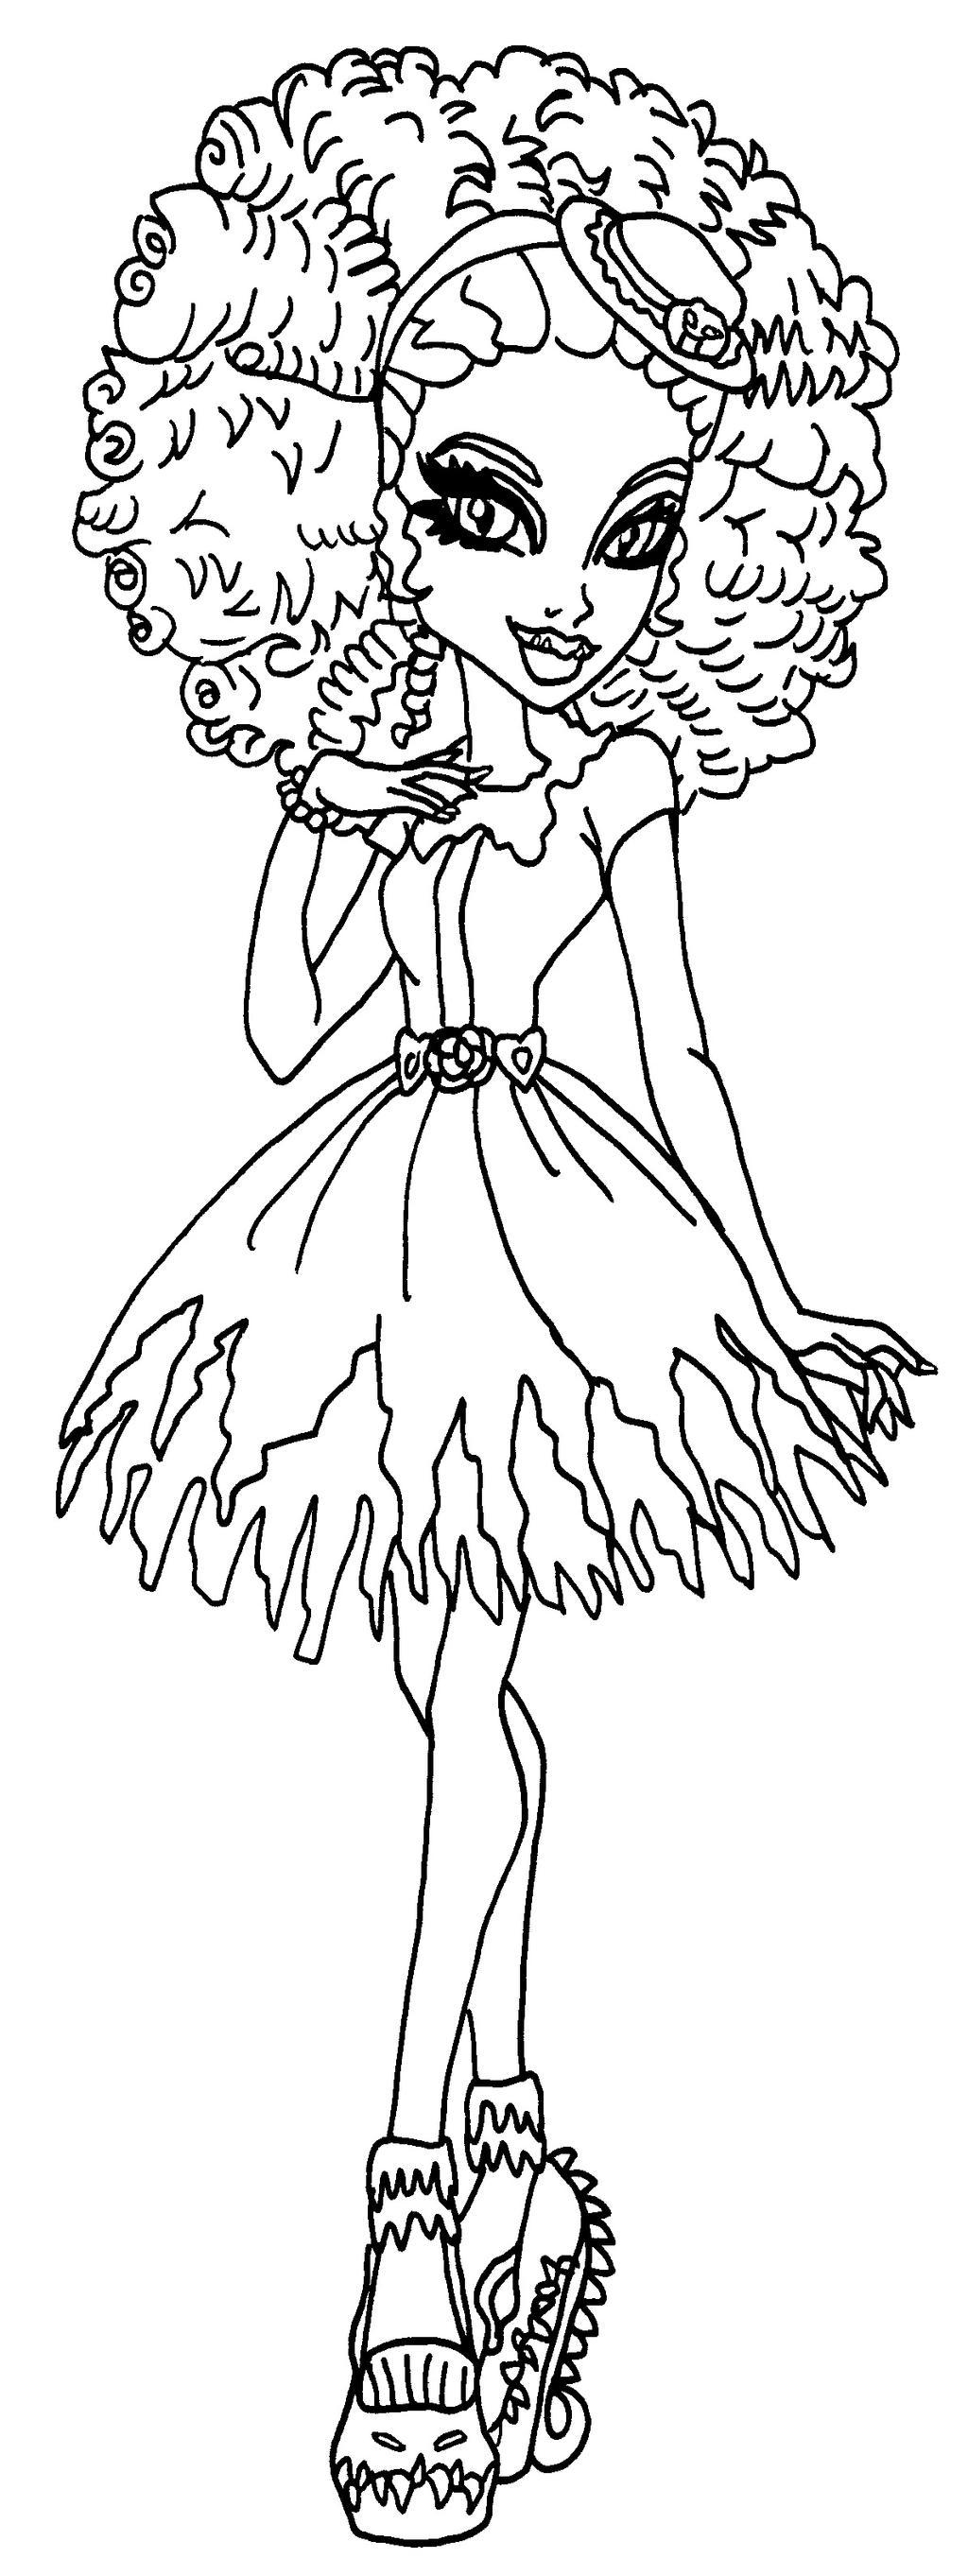 swamp monster coloring pages | Honey Swamp by elfkena on DeviantArt